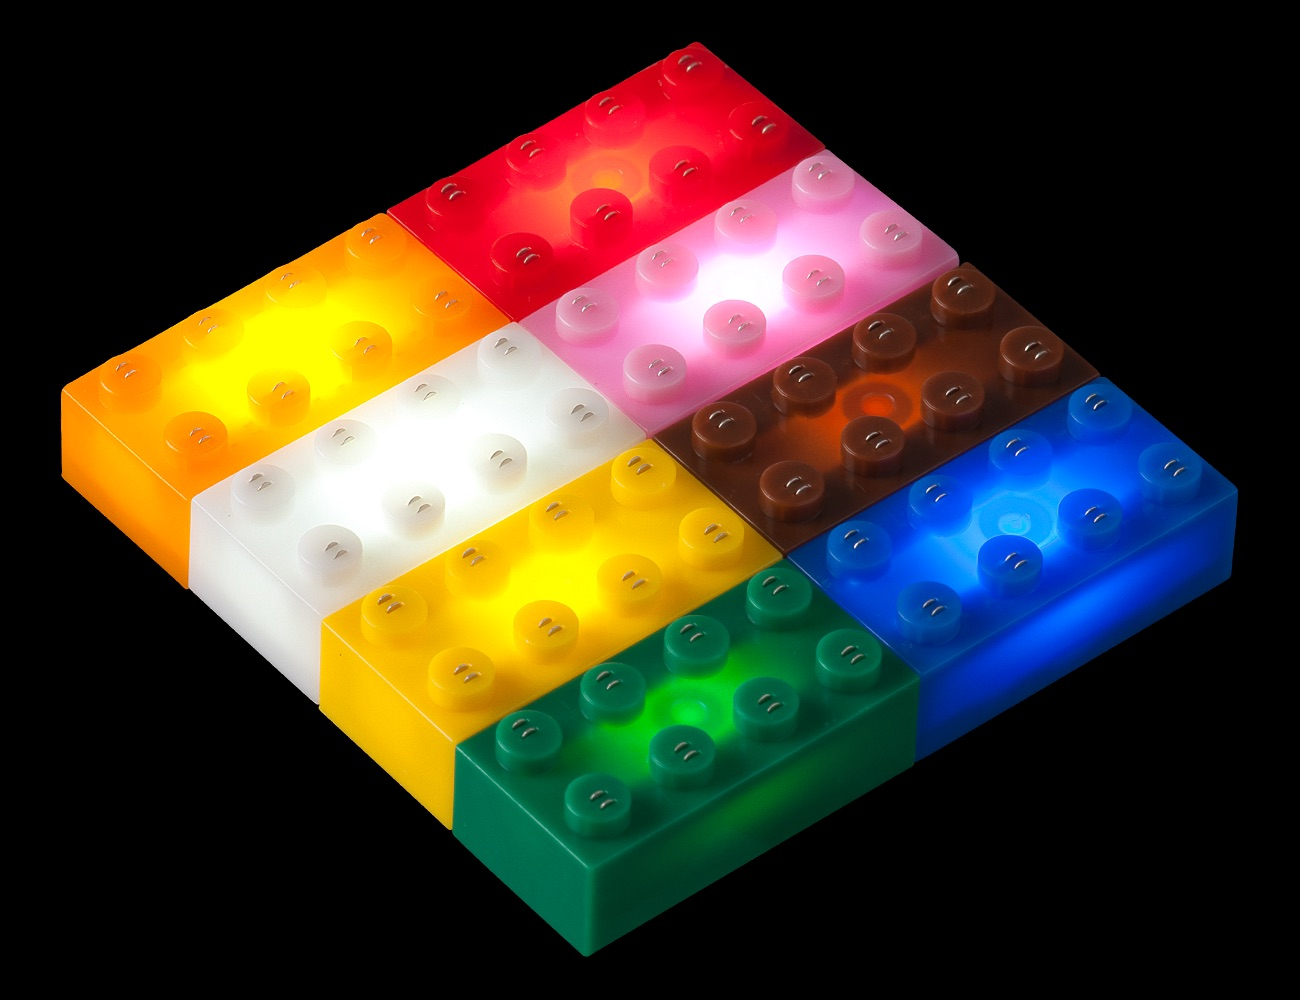 Light Stax Lego Meets Led 187 Gadget Flow